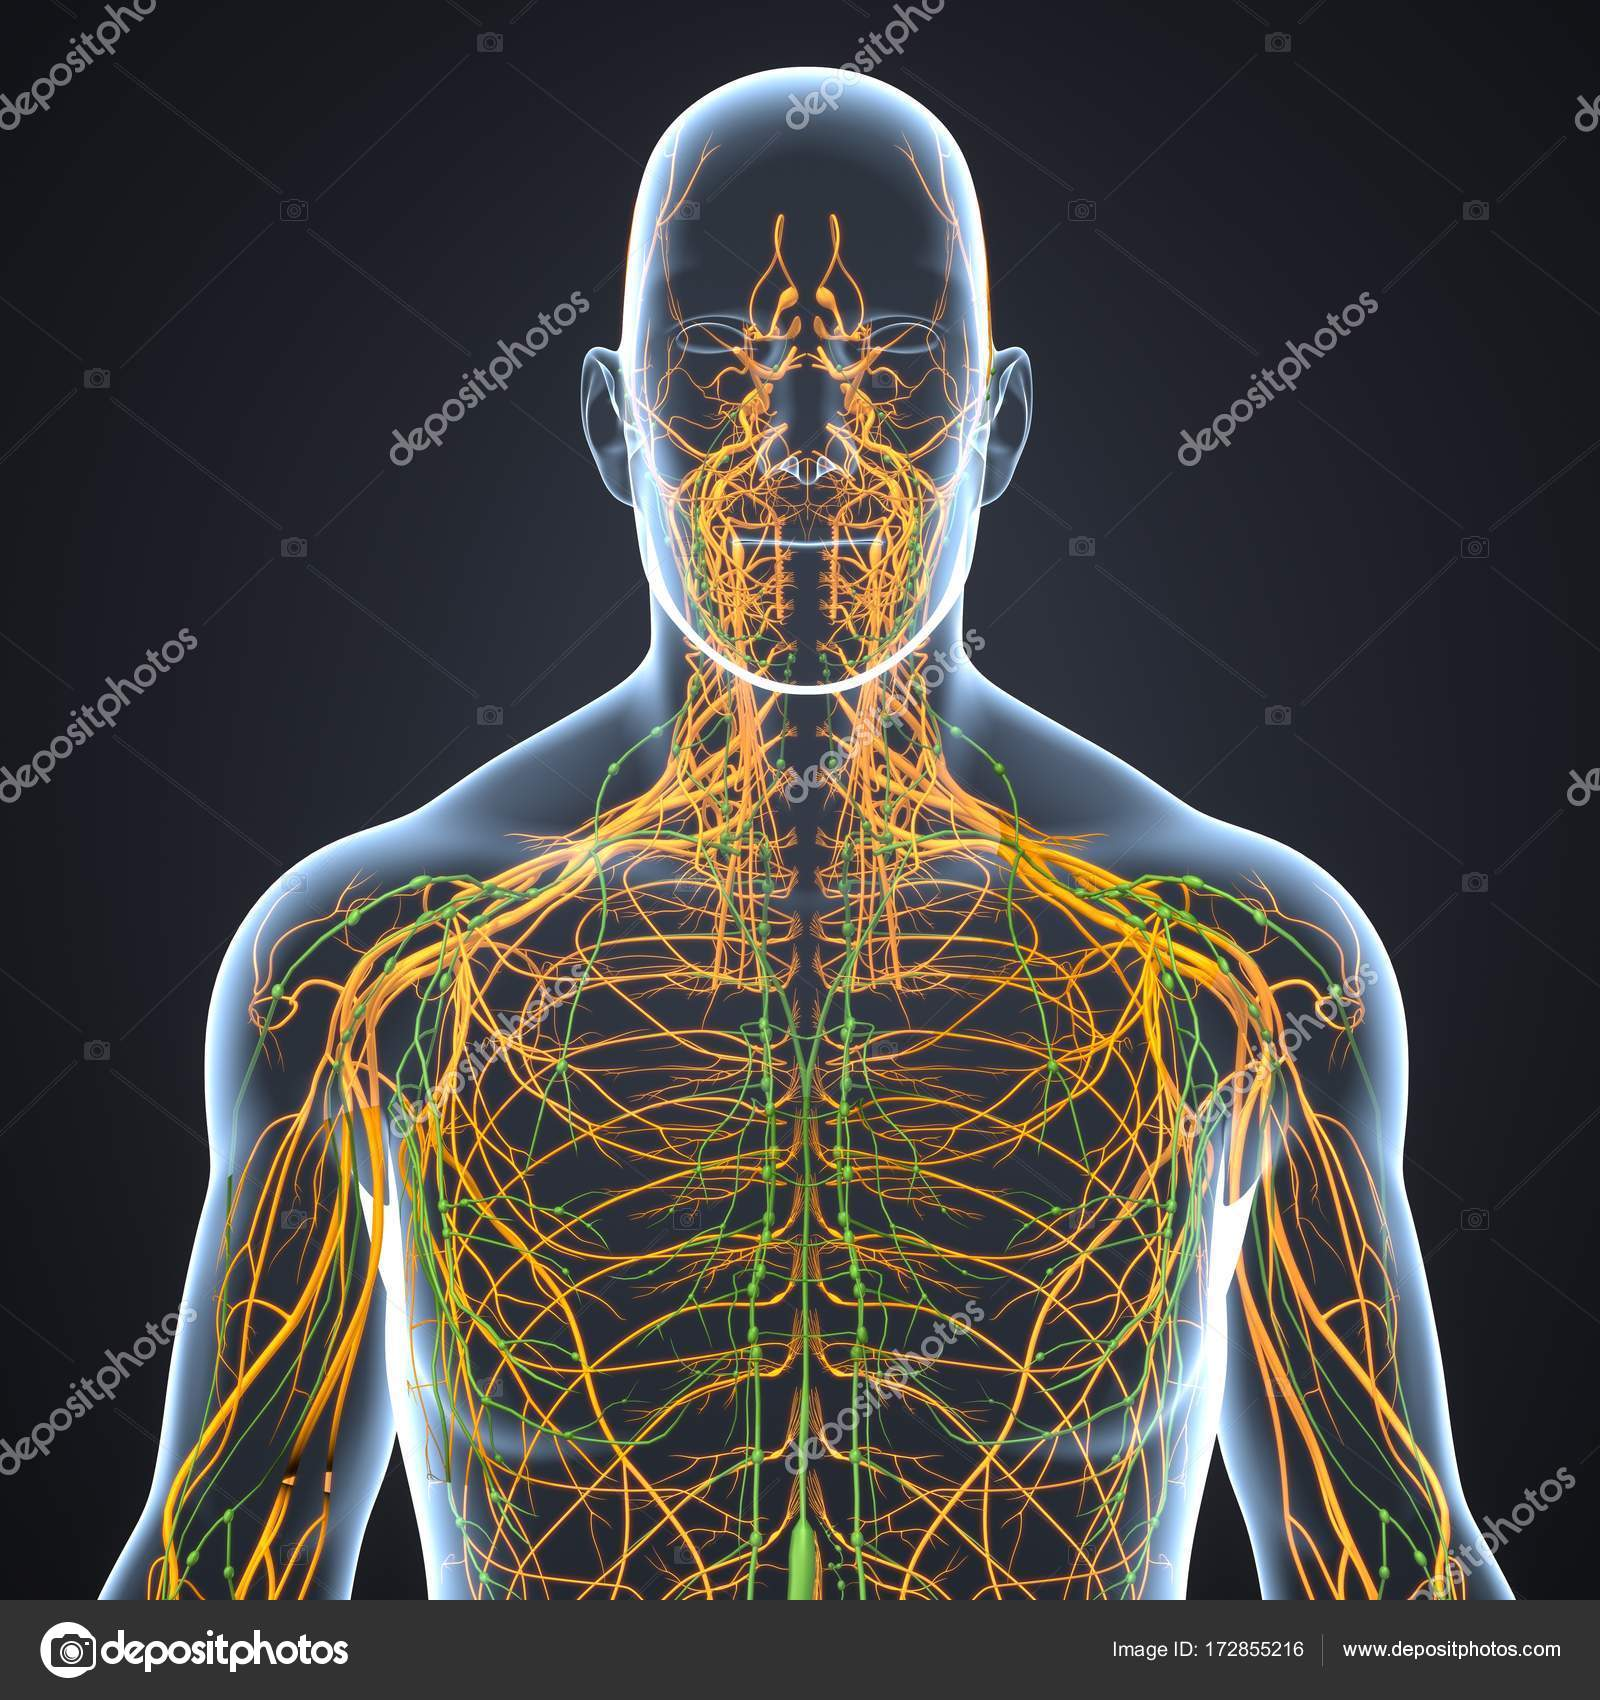 Sistema nervioso con ganglios linfáticos — Fotos de Stock ...